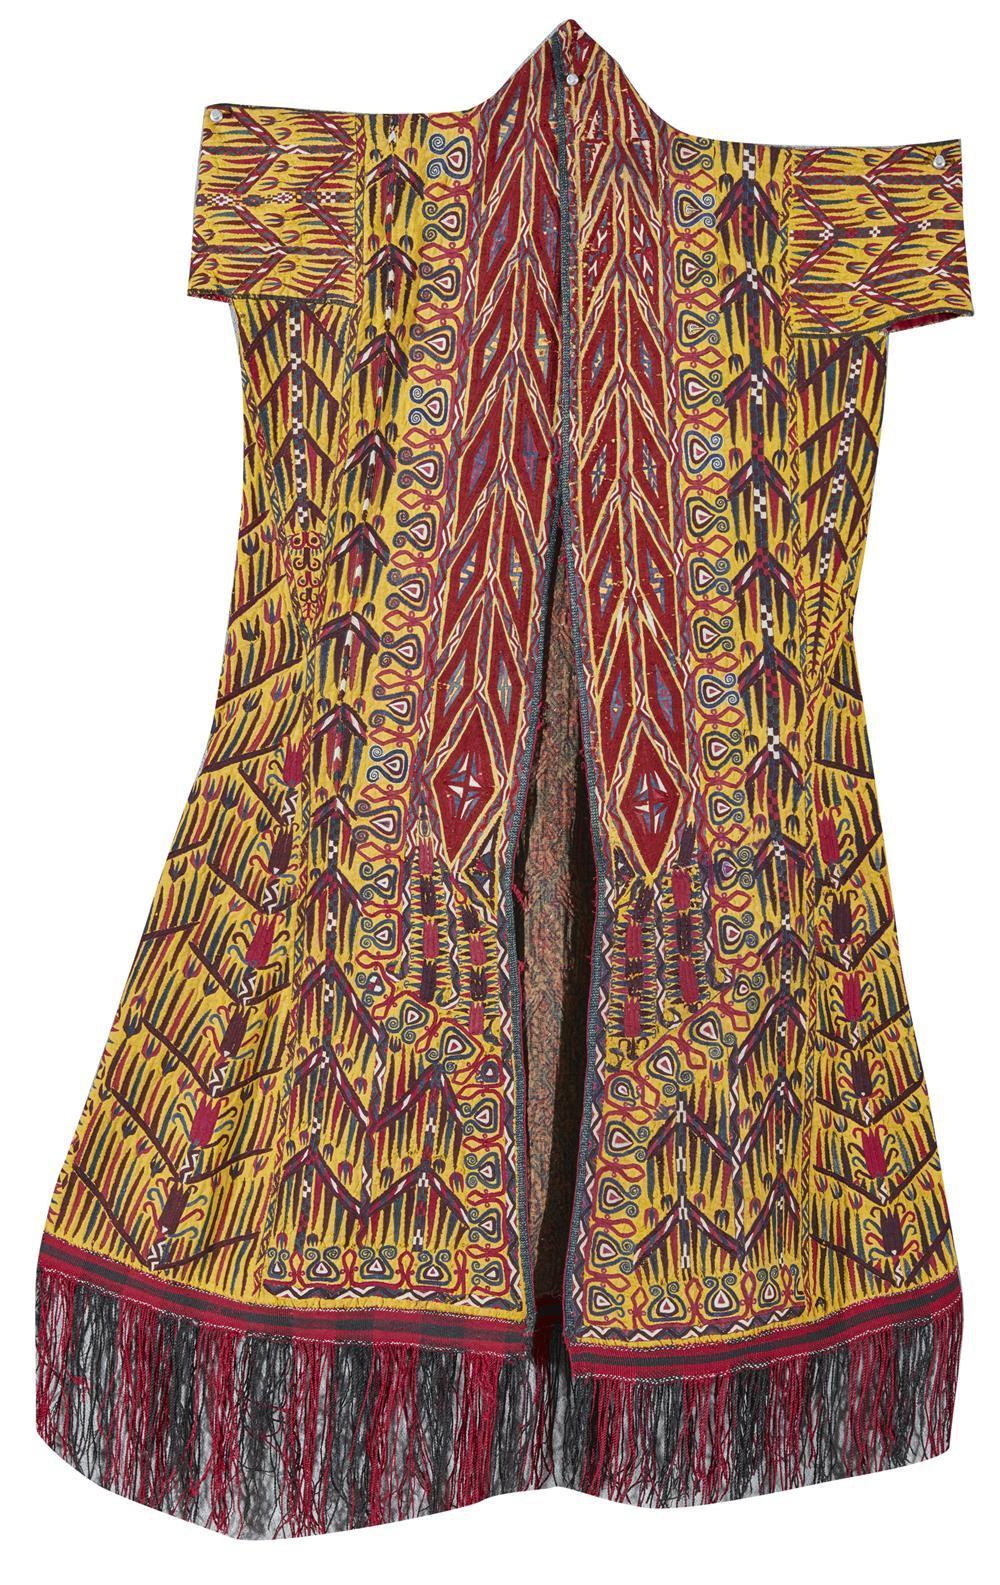 Turkmen Chirpy, 19th century; length: 40 in.